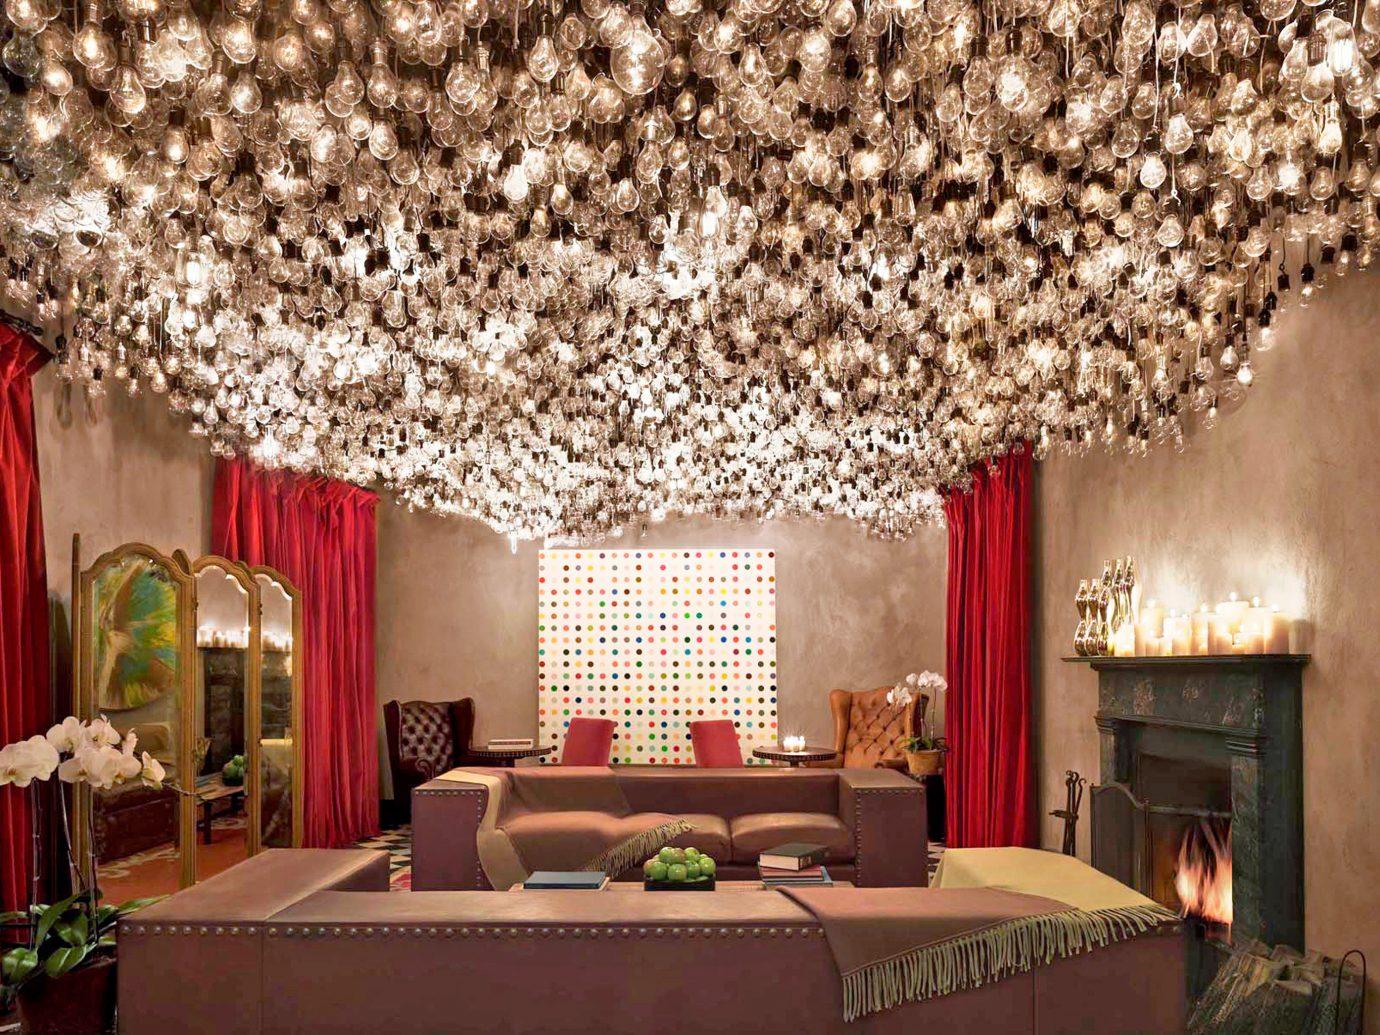 City Design Hotels Lounge Luxury Luxury Travel Romance Romantic Hotels indoor room interior design living room lighting ceiling estate decorated furniture